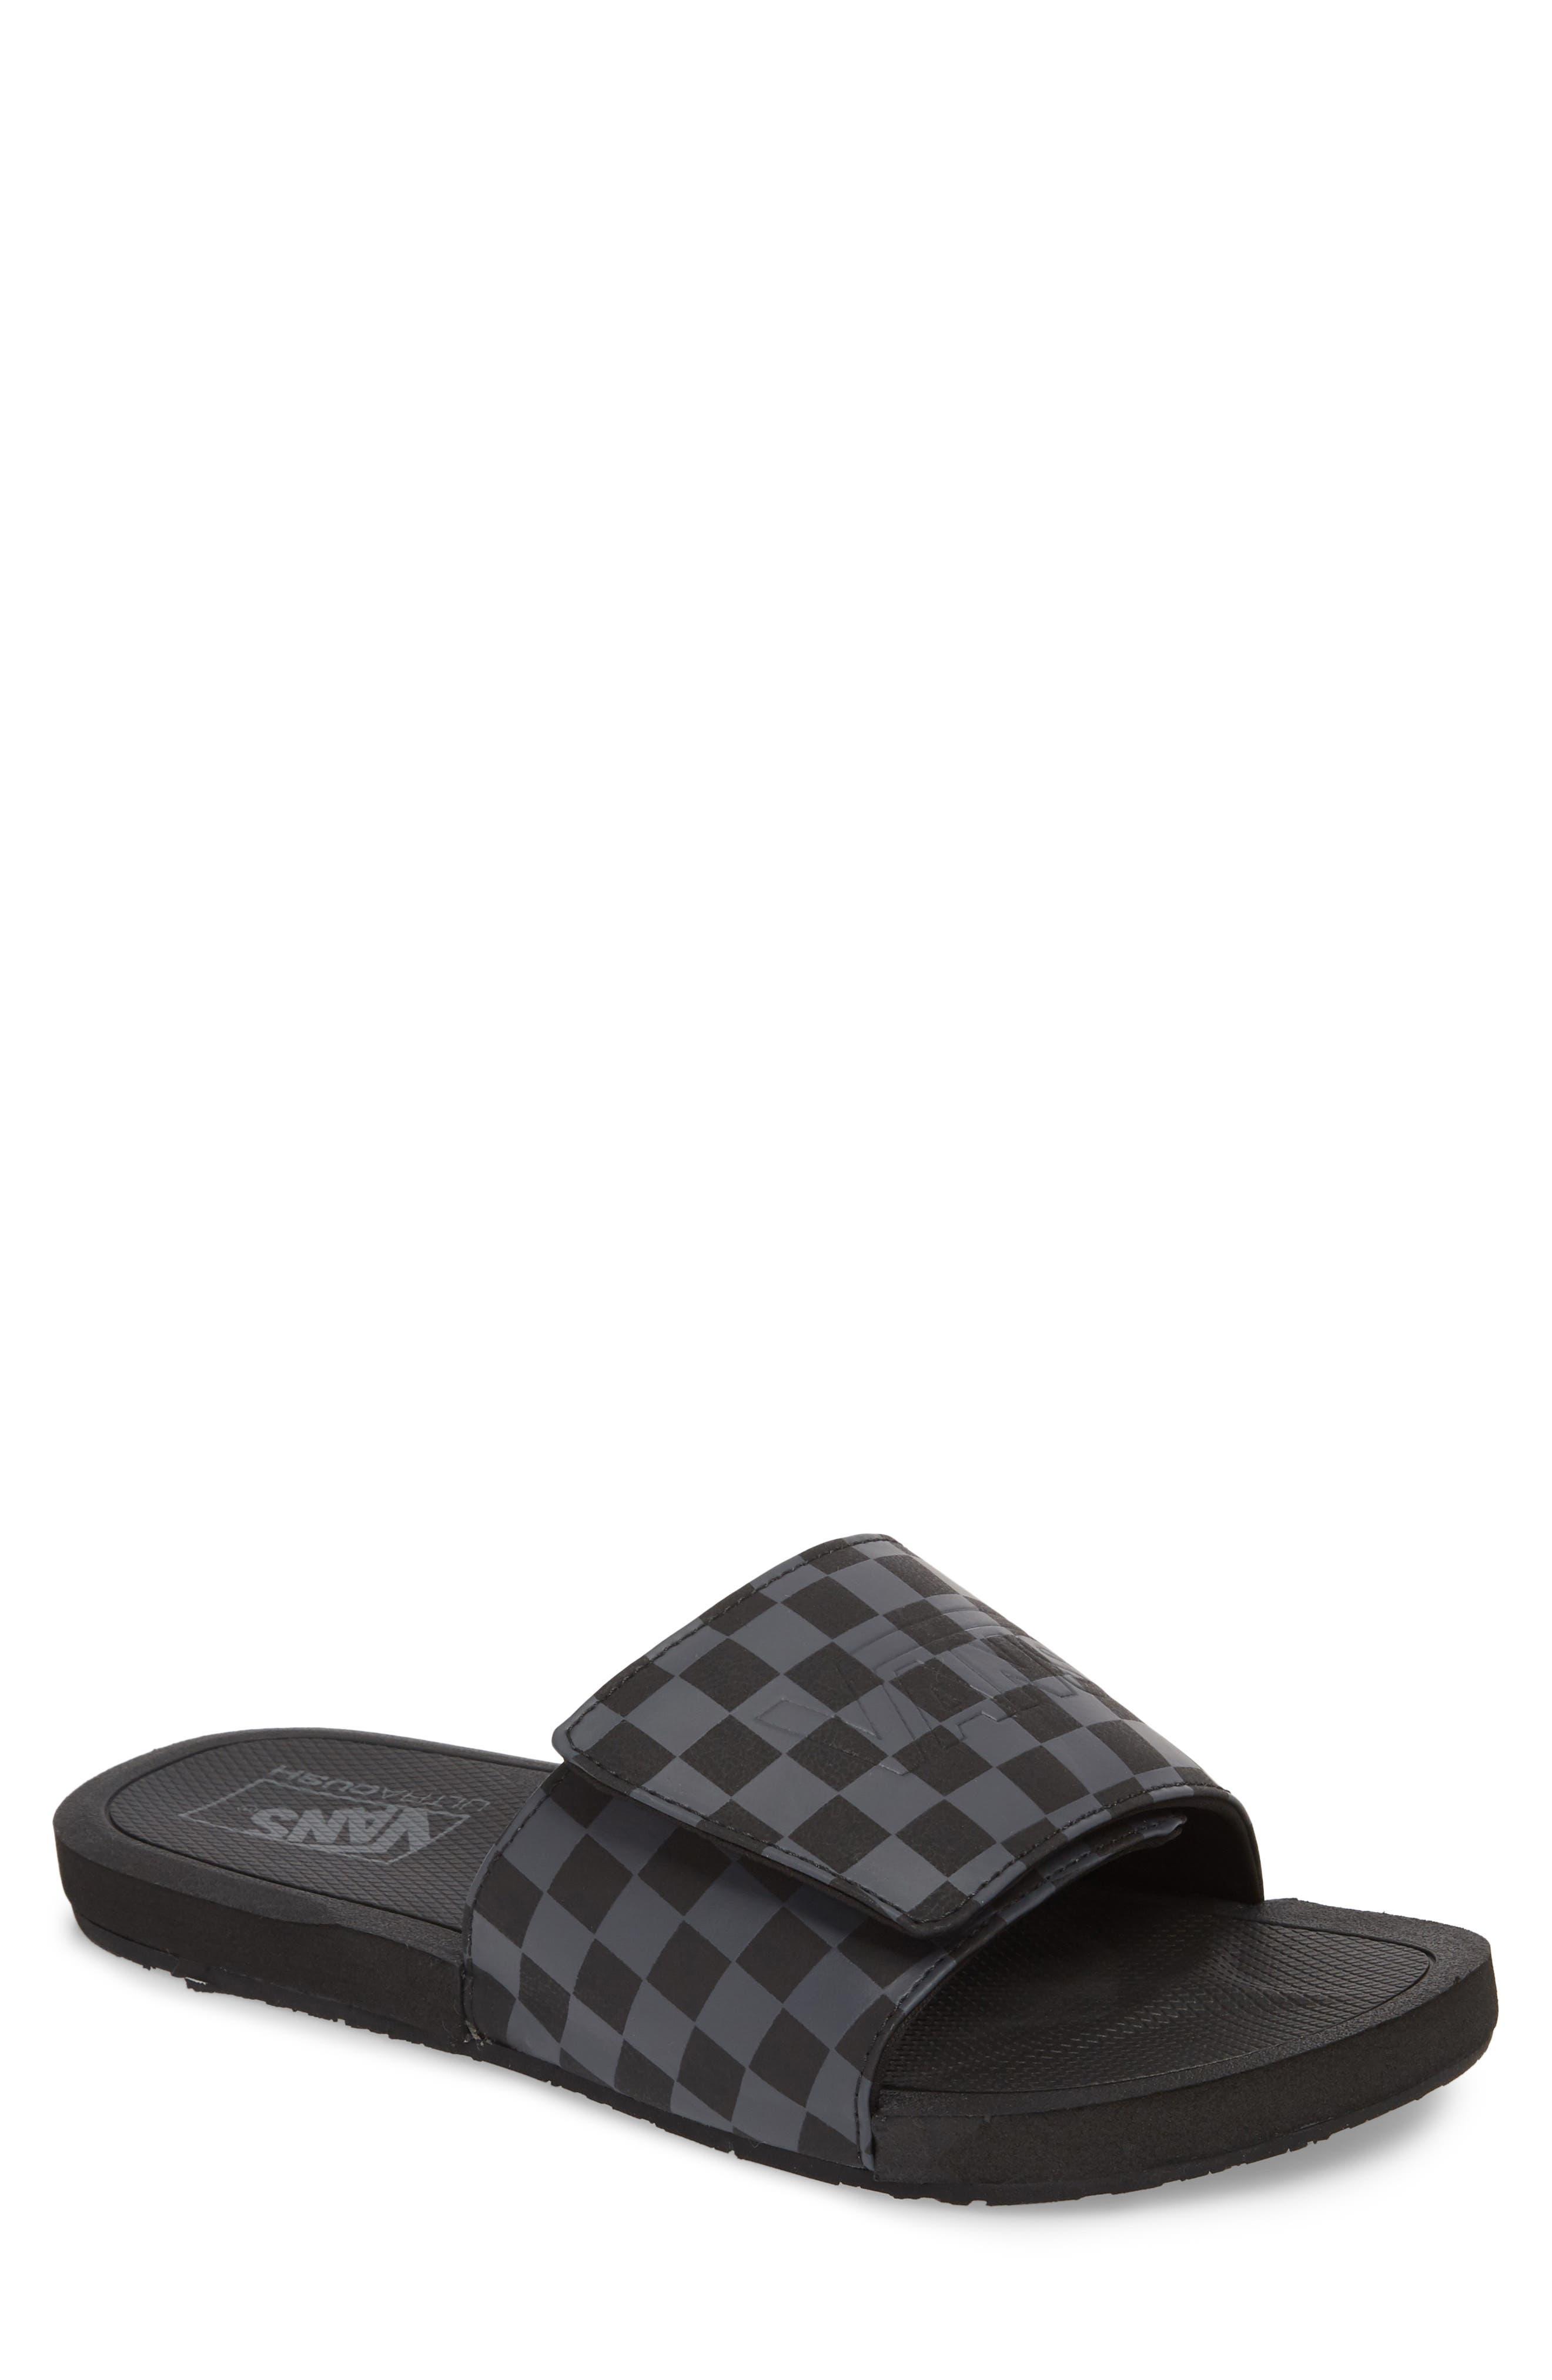 Nexpa Slide Sandal, Main, color, 001